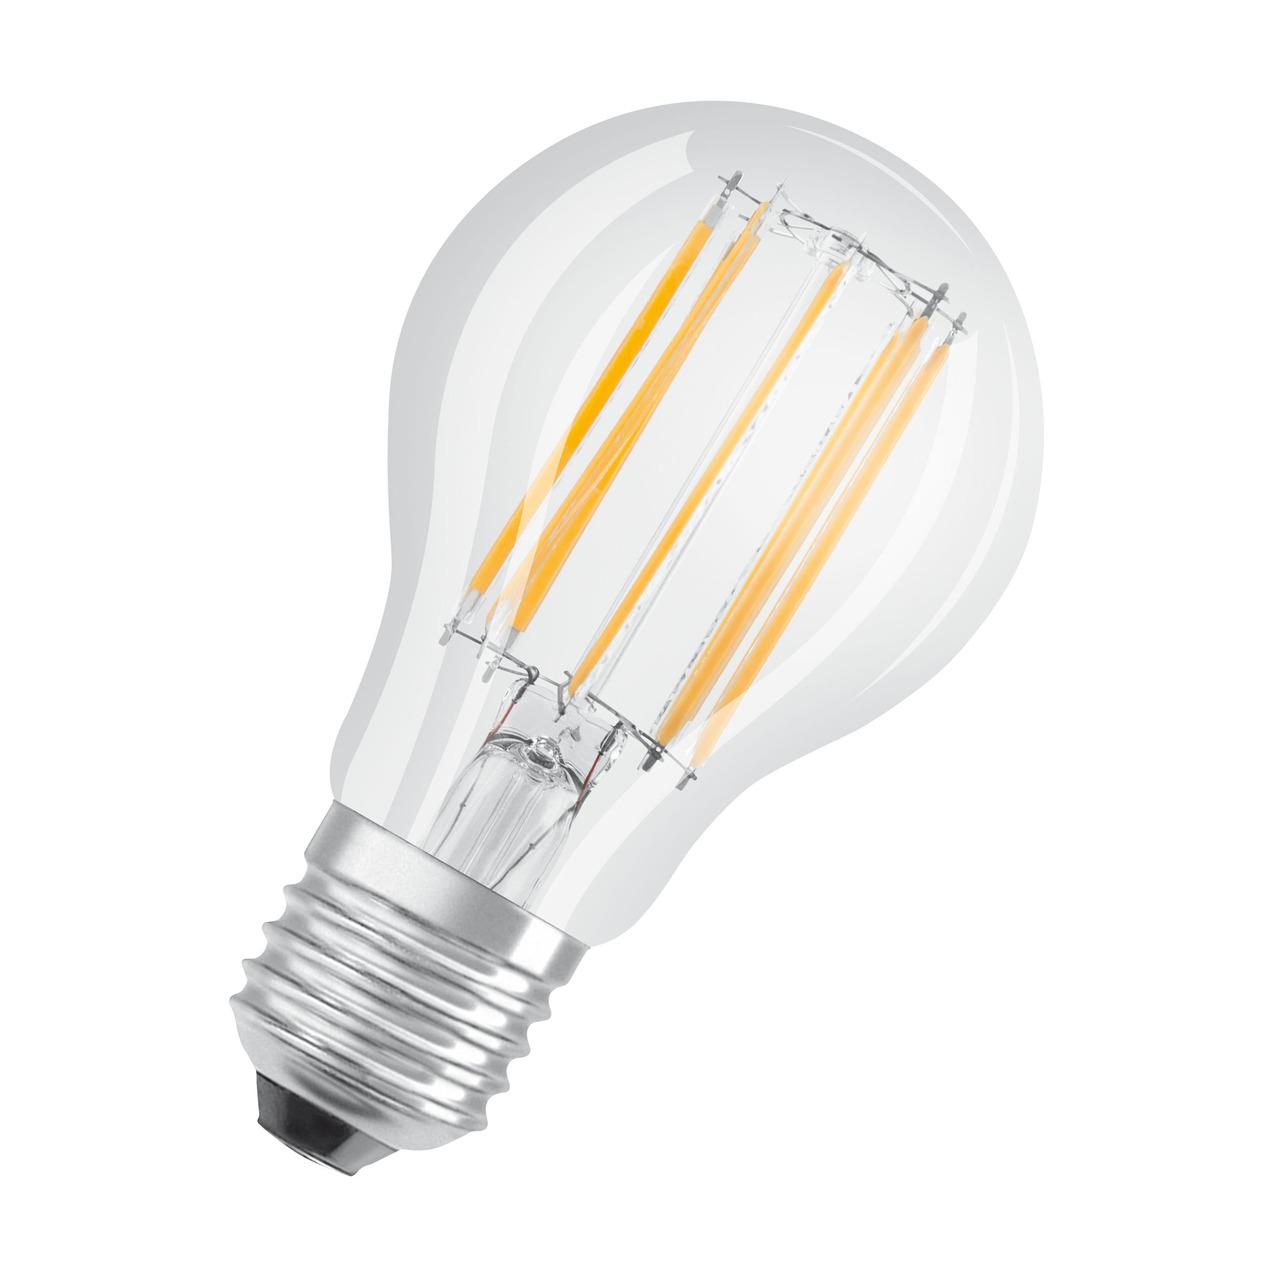 OSRAM LED STAR 10-W-Filament-LED-Lampe E27- neutralweiss-klar